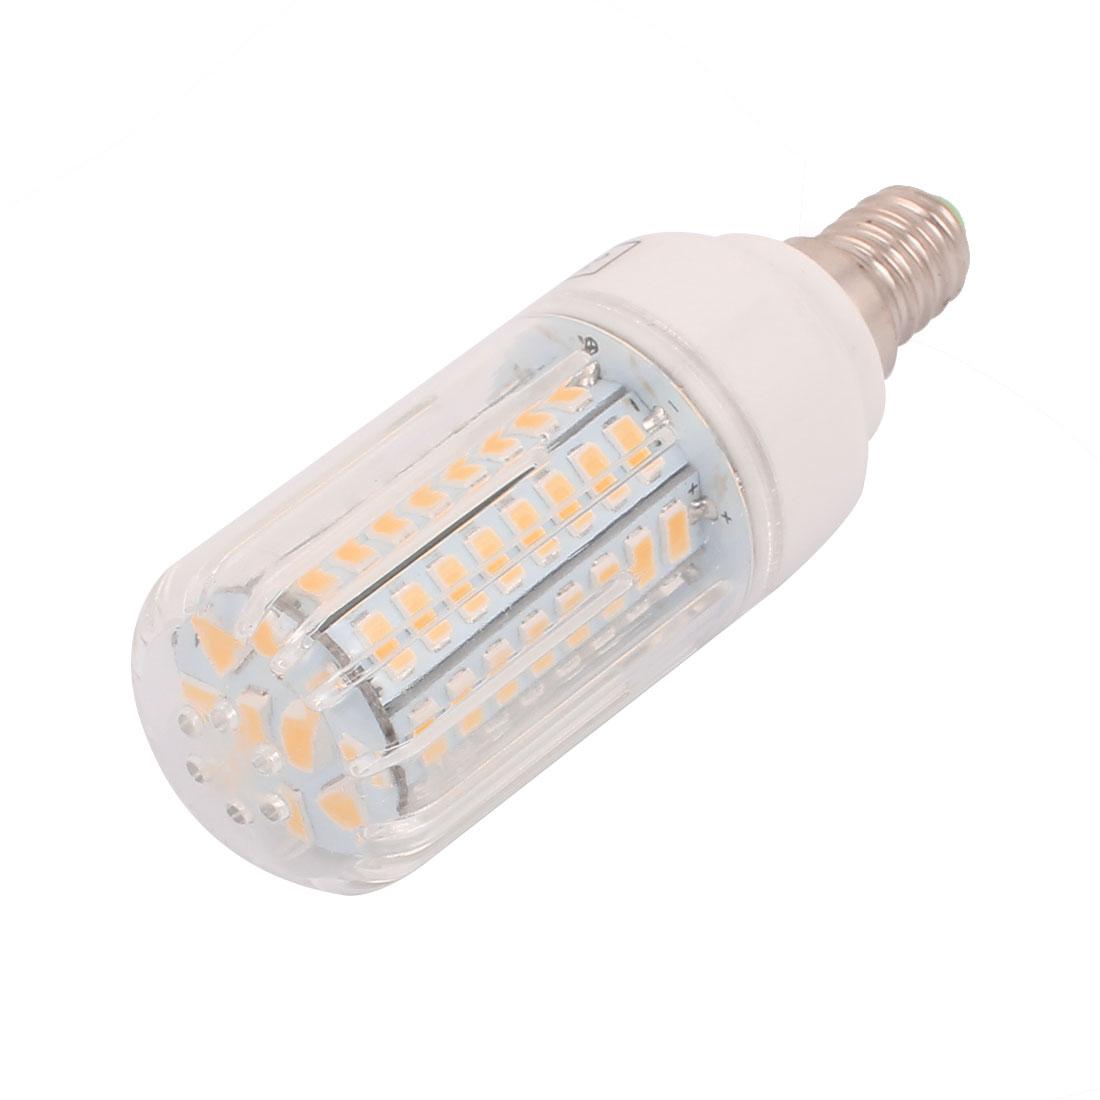 AC110V 7W 72 x 5736SMD E14 LED Corn Bulb Light Lamp Energy Saving Warm White